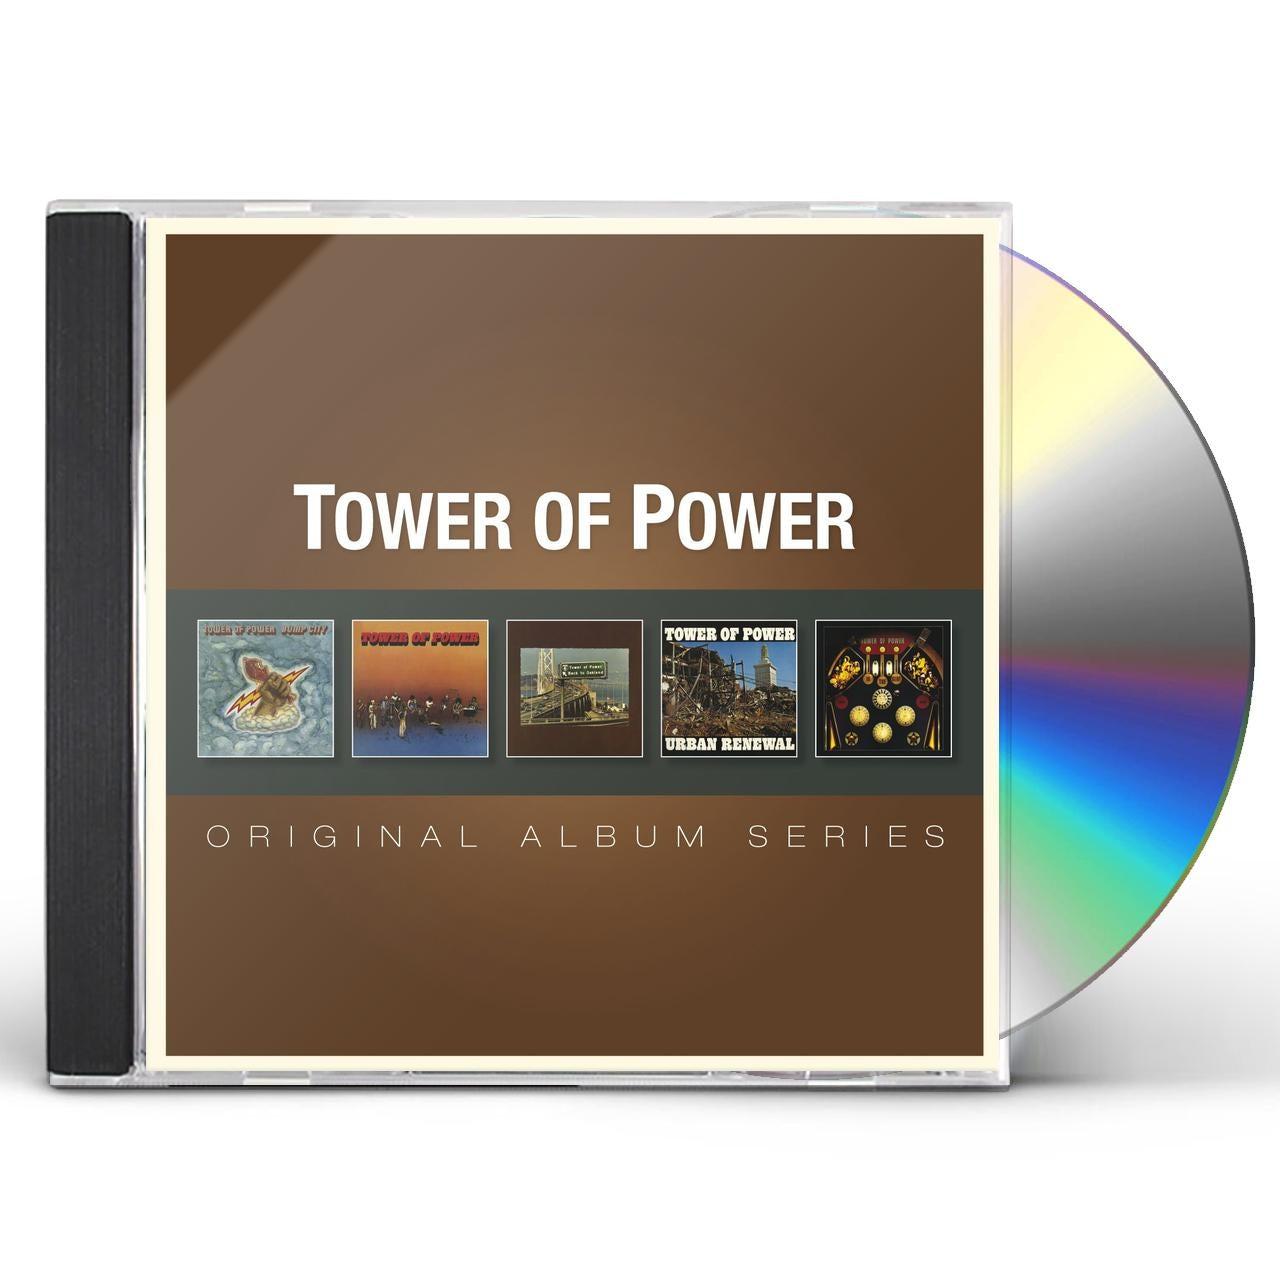 Tower Of Power - CD Original Album Series